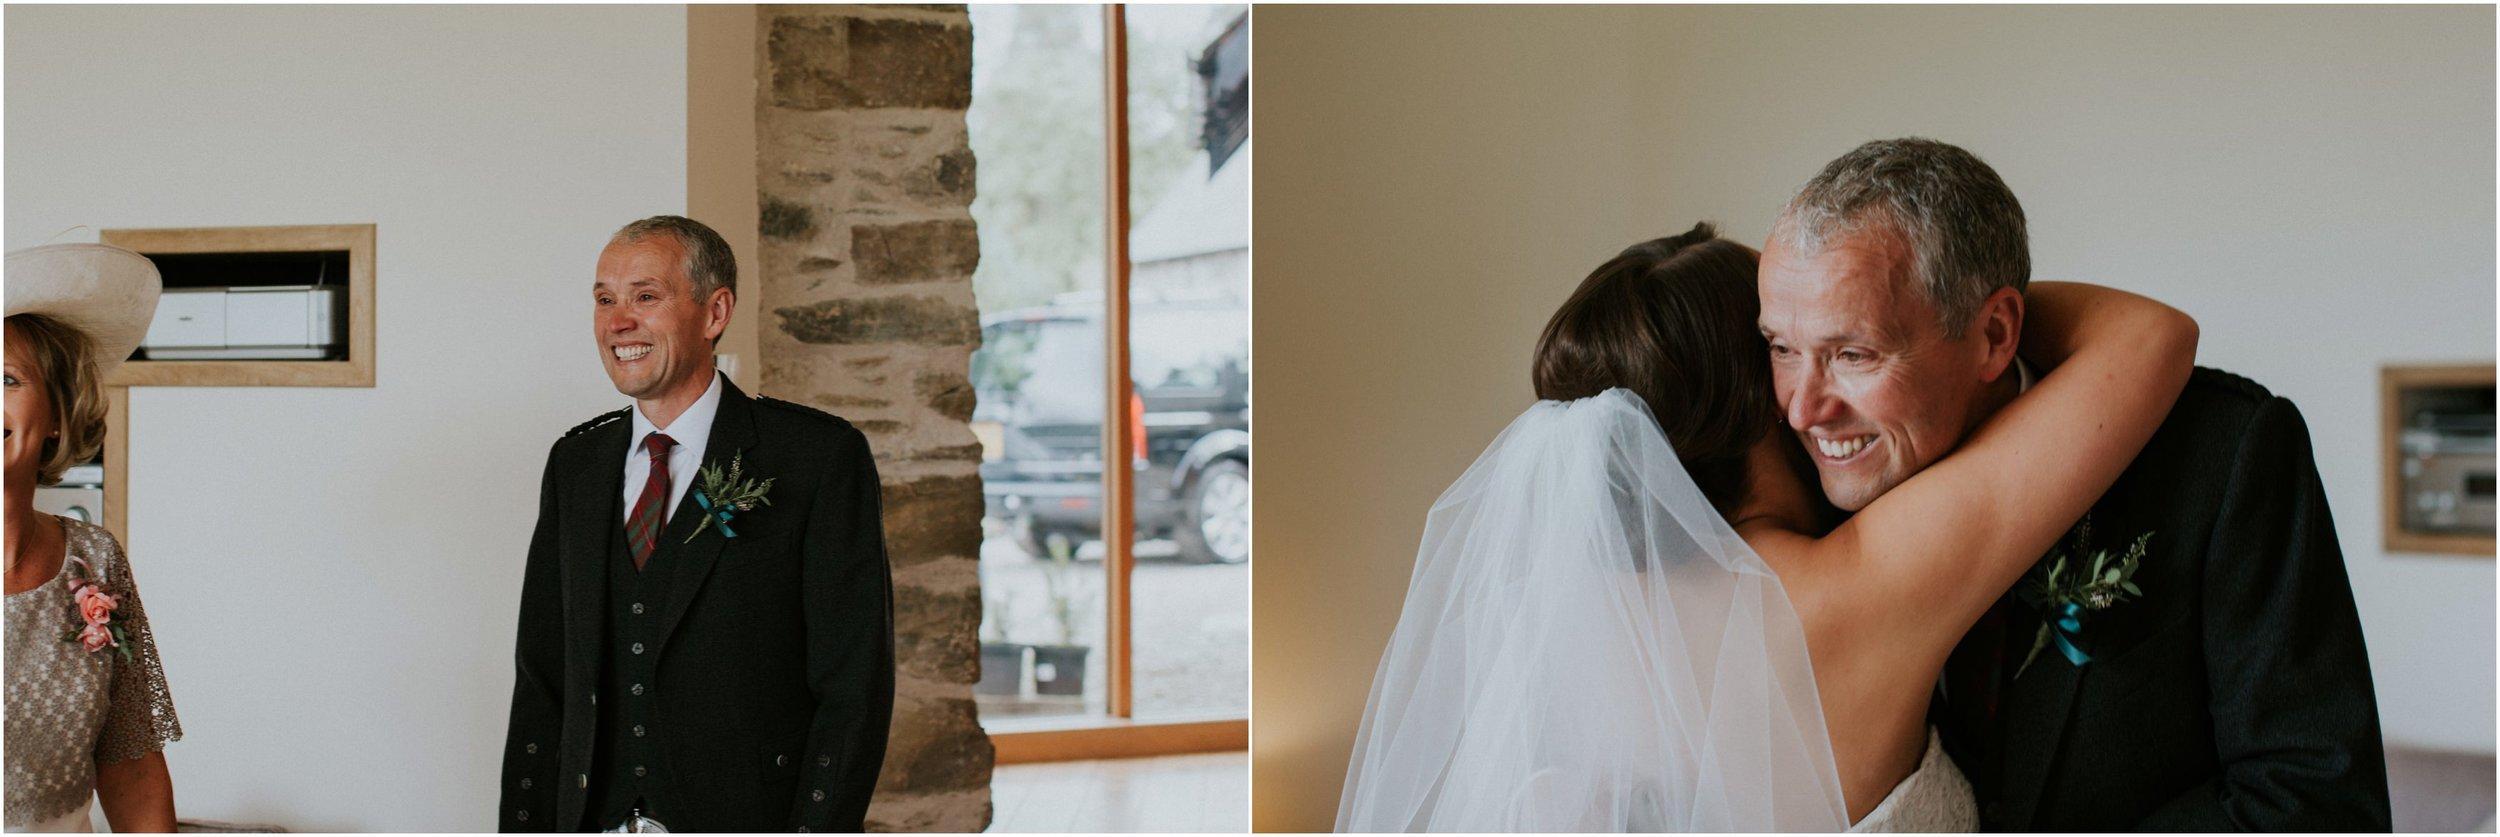 Photography 78 - Glasgow Wedding Photographer - Year in Reveiw_0039.jpg